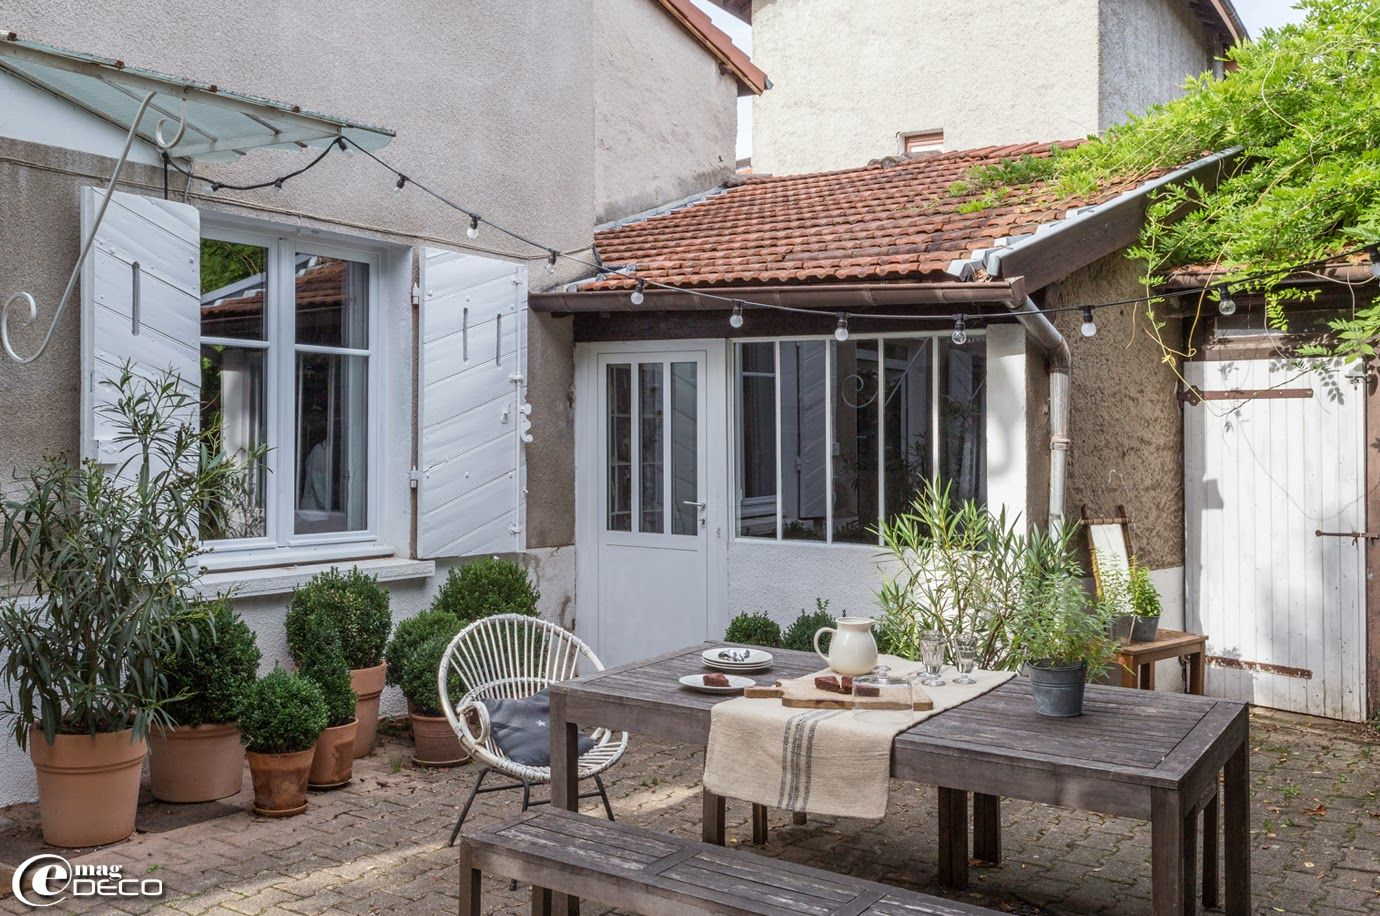 Jardins, florence and céréales on pinterest